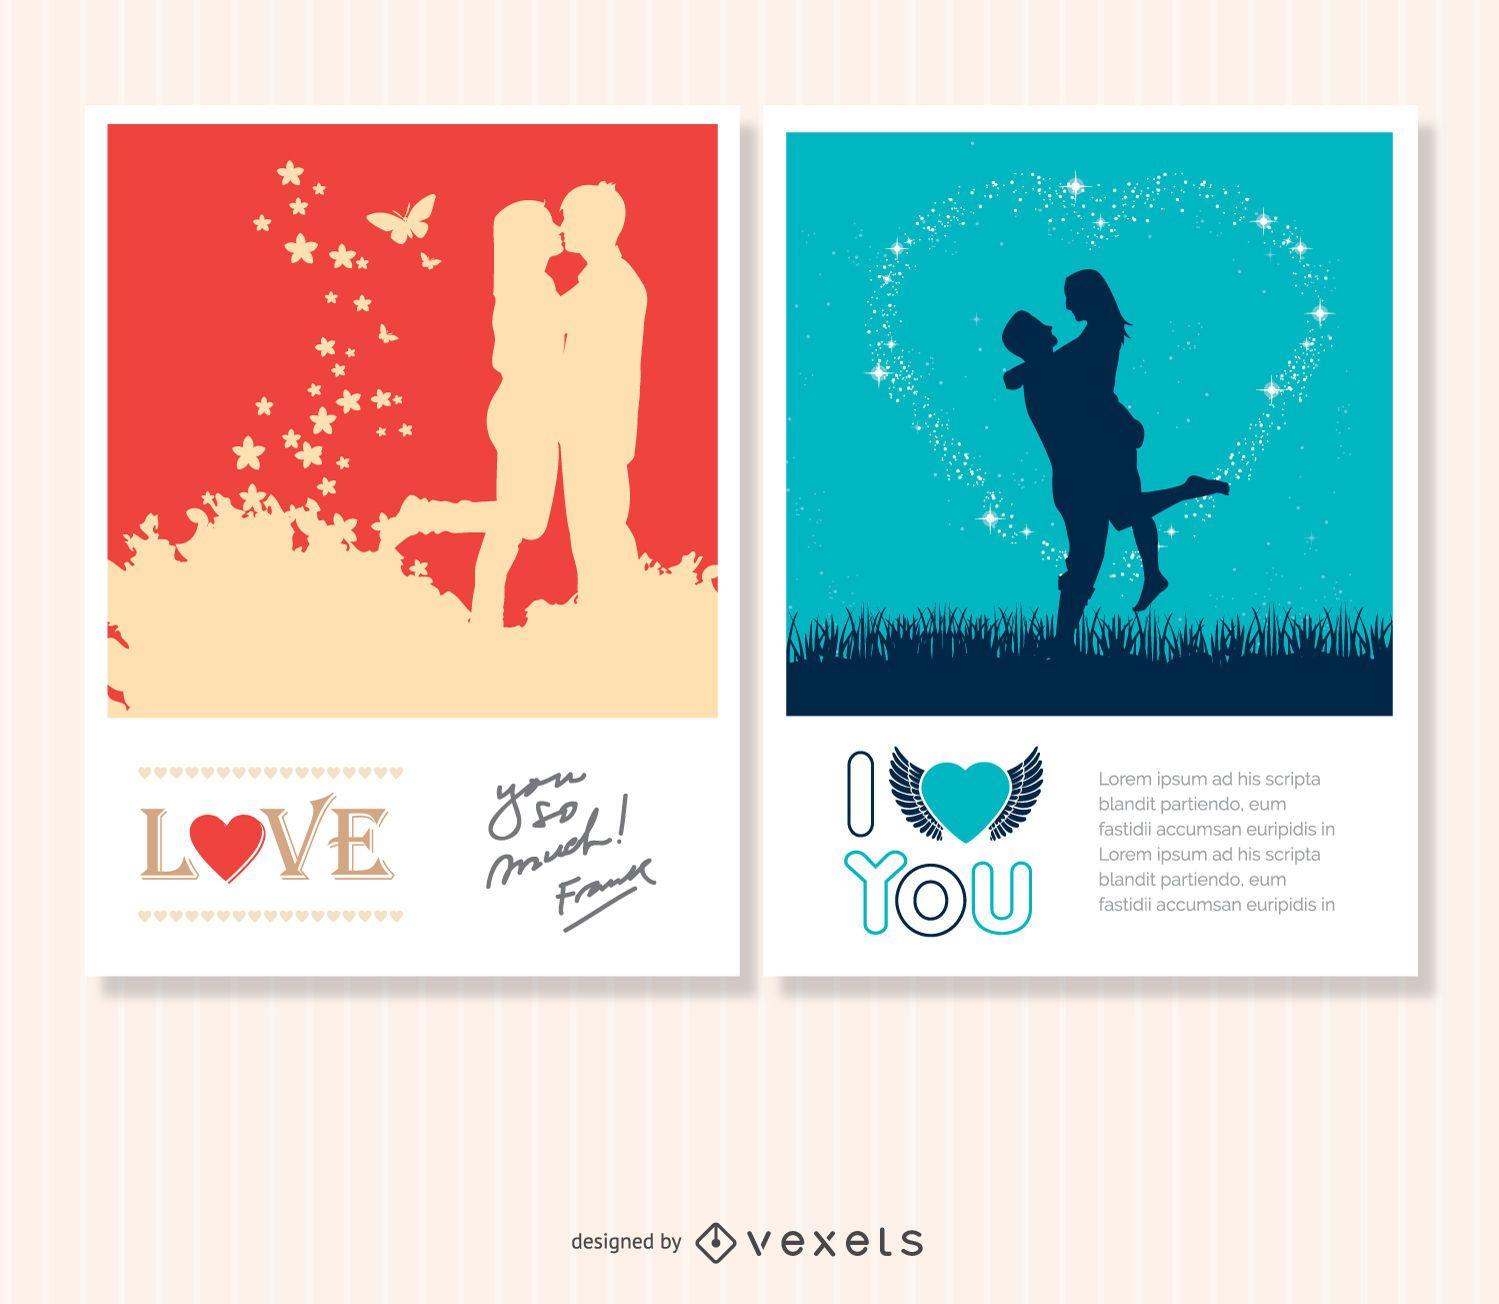 2 Valentine's love cards